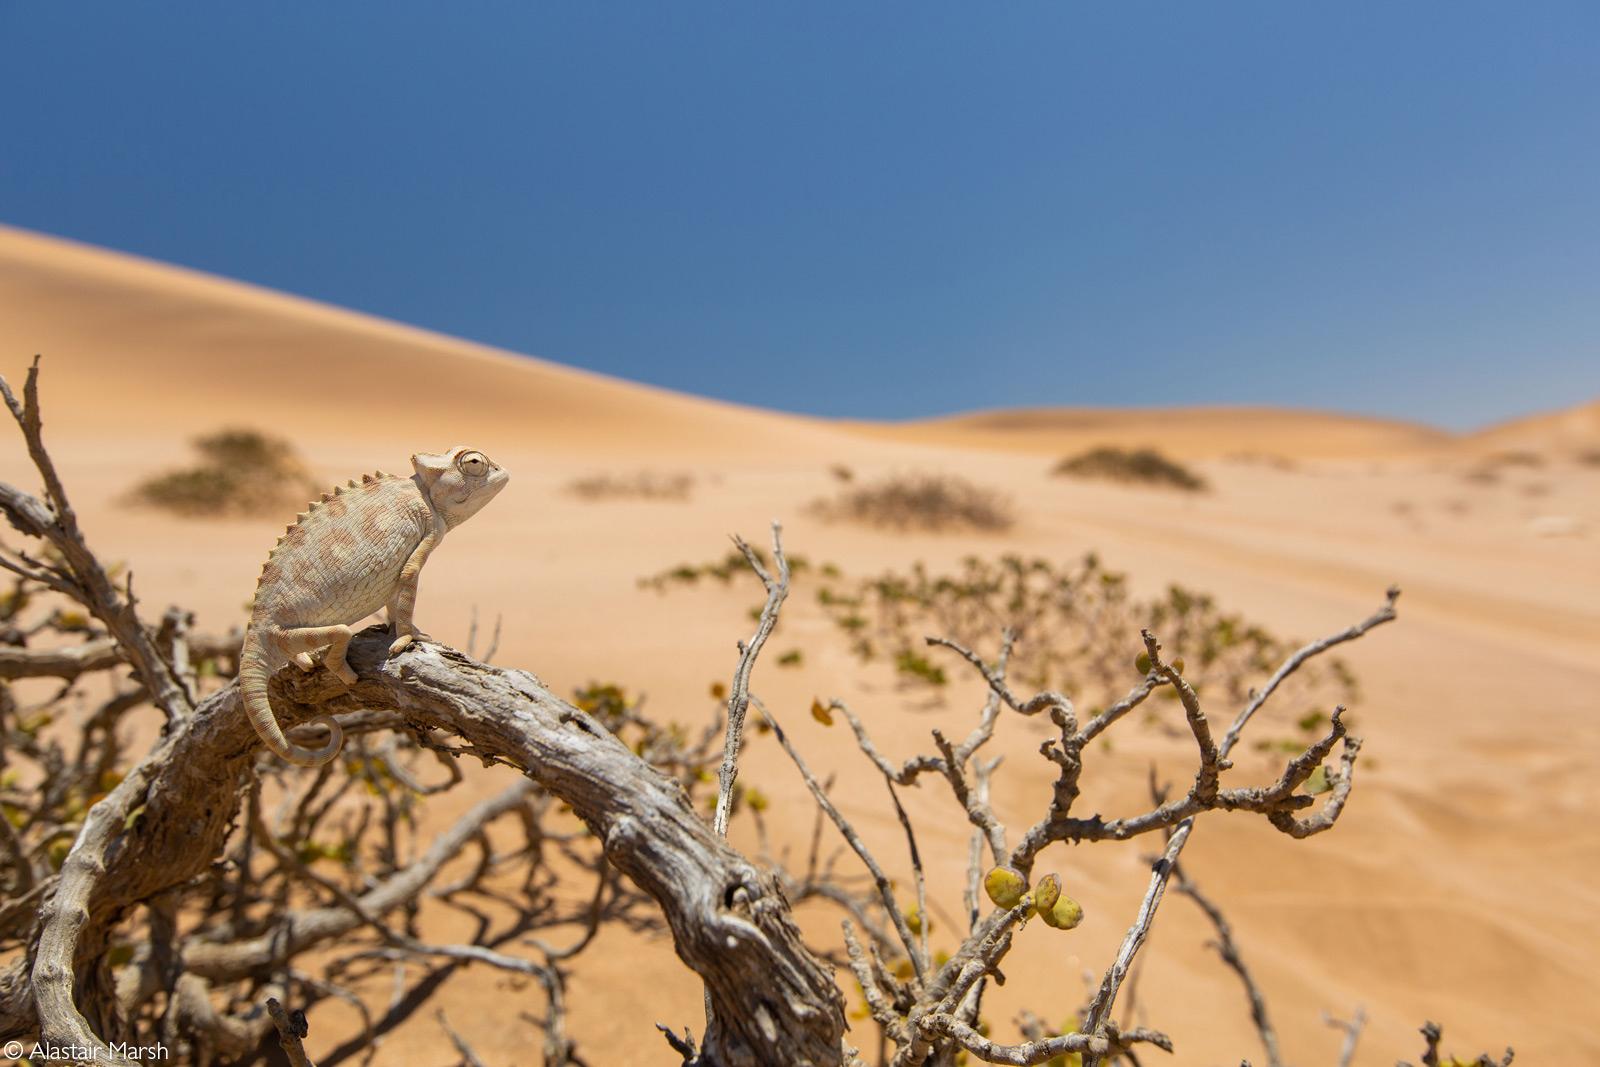 A Namaqua chameleon surveying its surroundings in the Namib Desert. Near Swakopmund, Namibia © Alastair Marsh